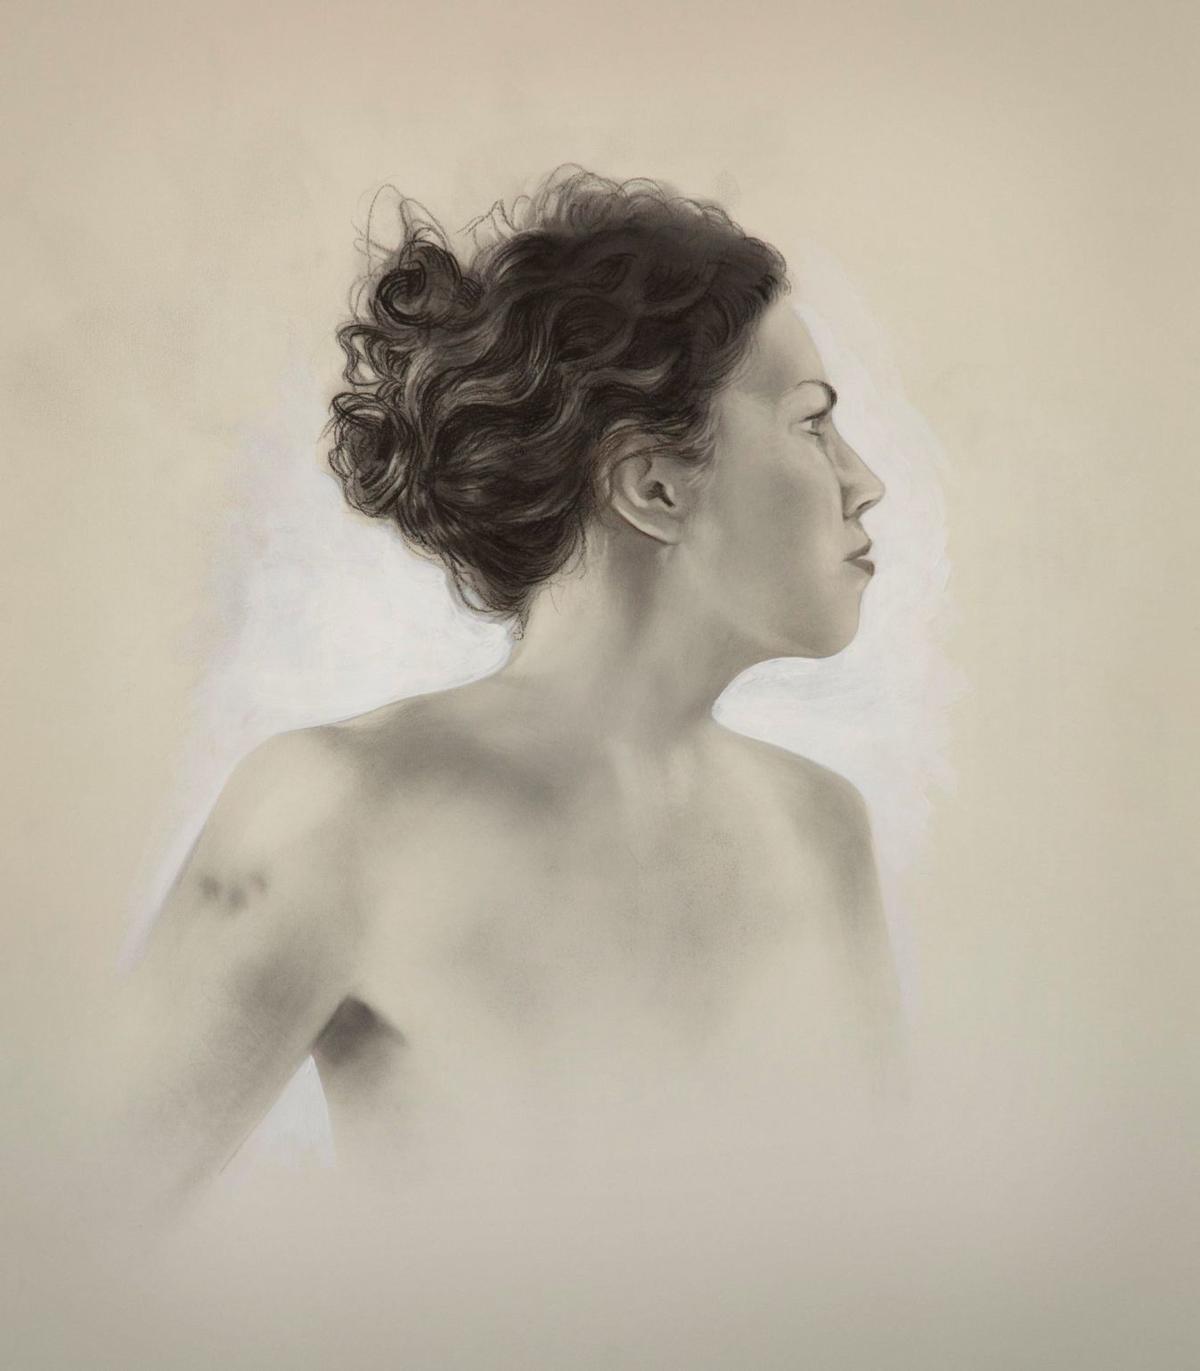 Omaha artist Tim Guthrie